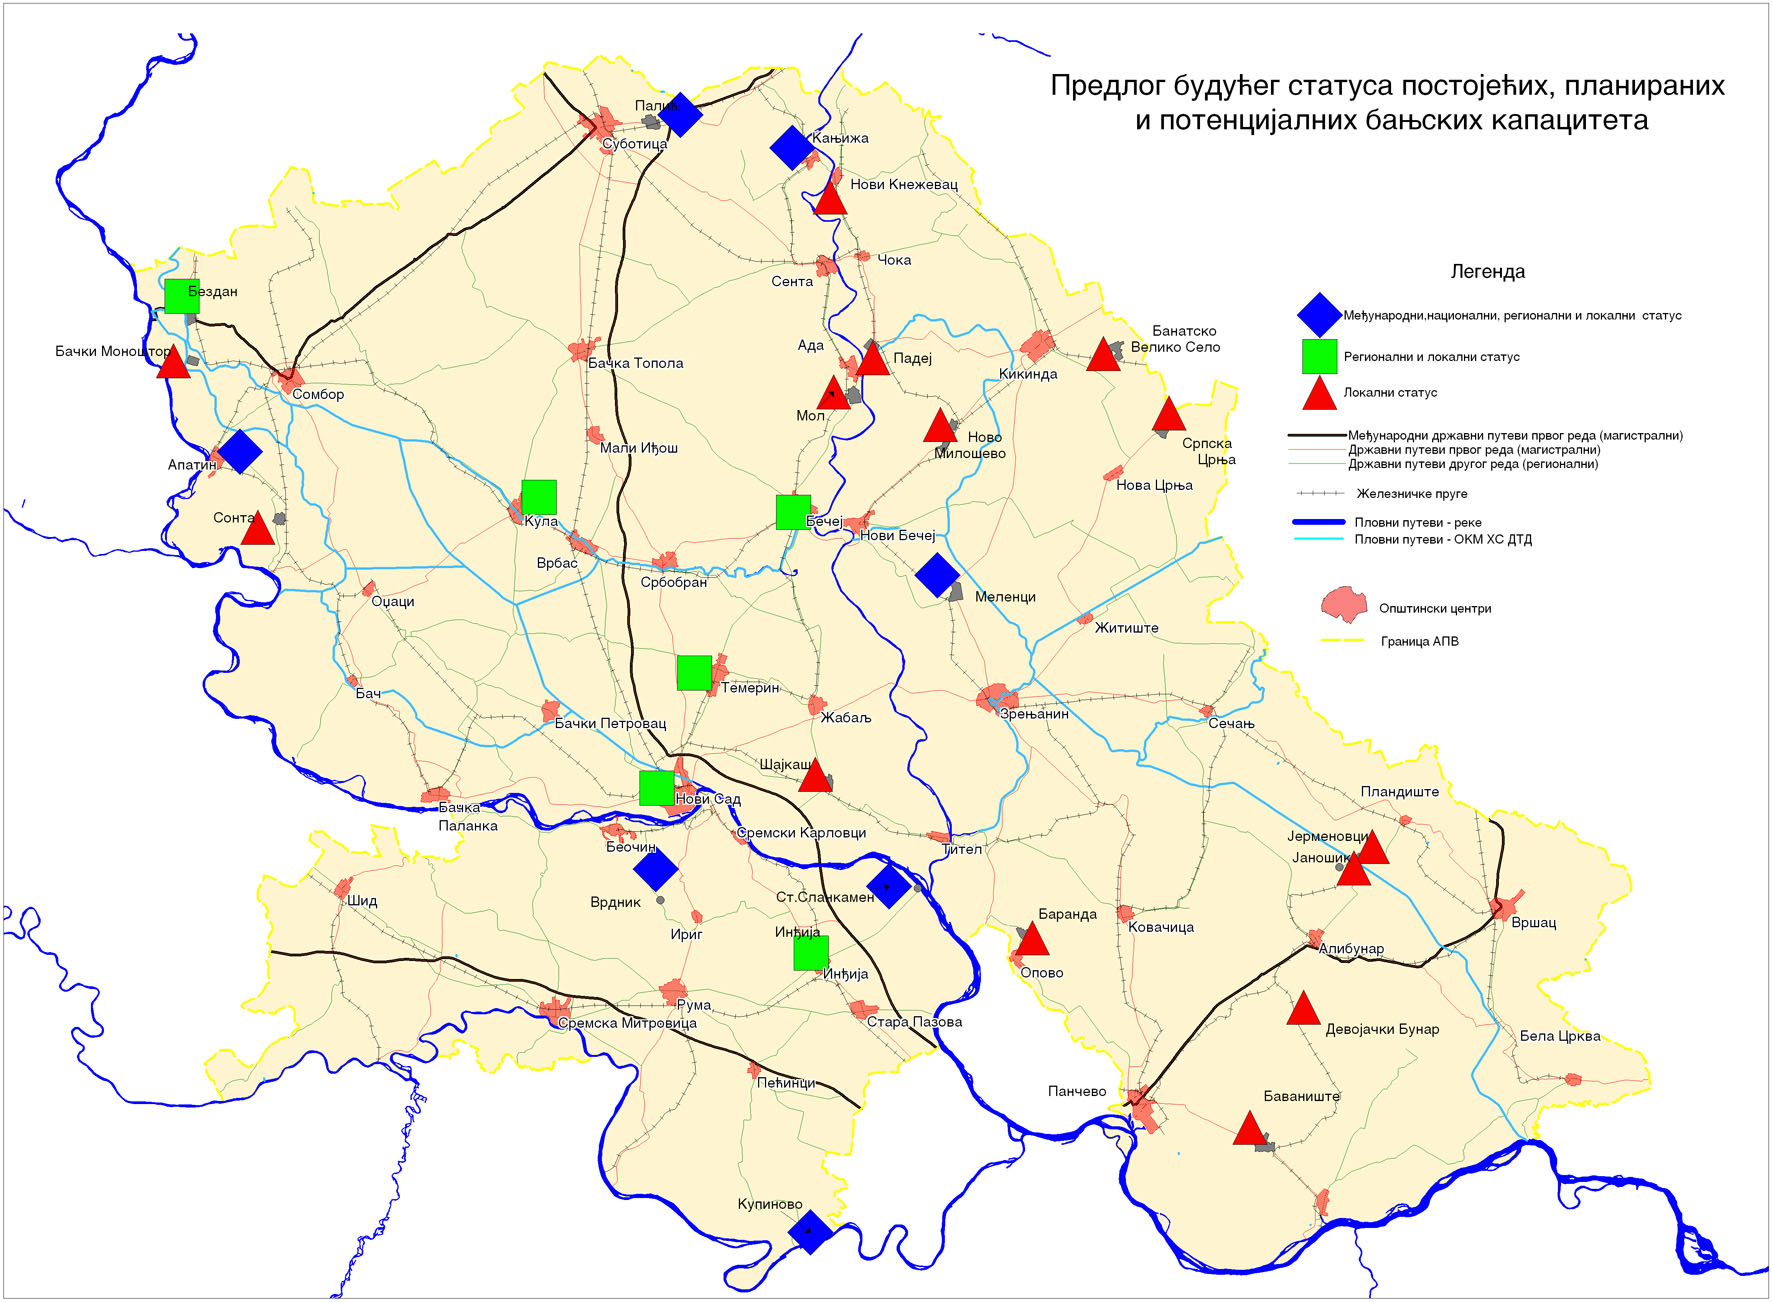 turisticka karta vojvodine JP Zavod za urbanizam Vojvodine   Studije turisticka karta vojvodine